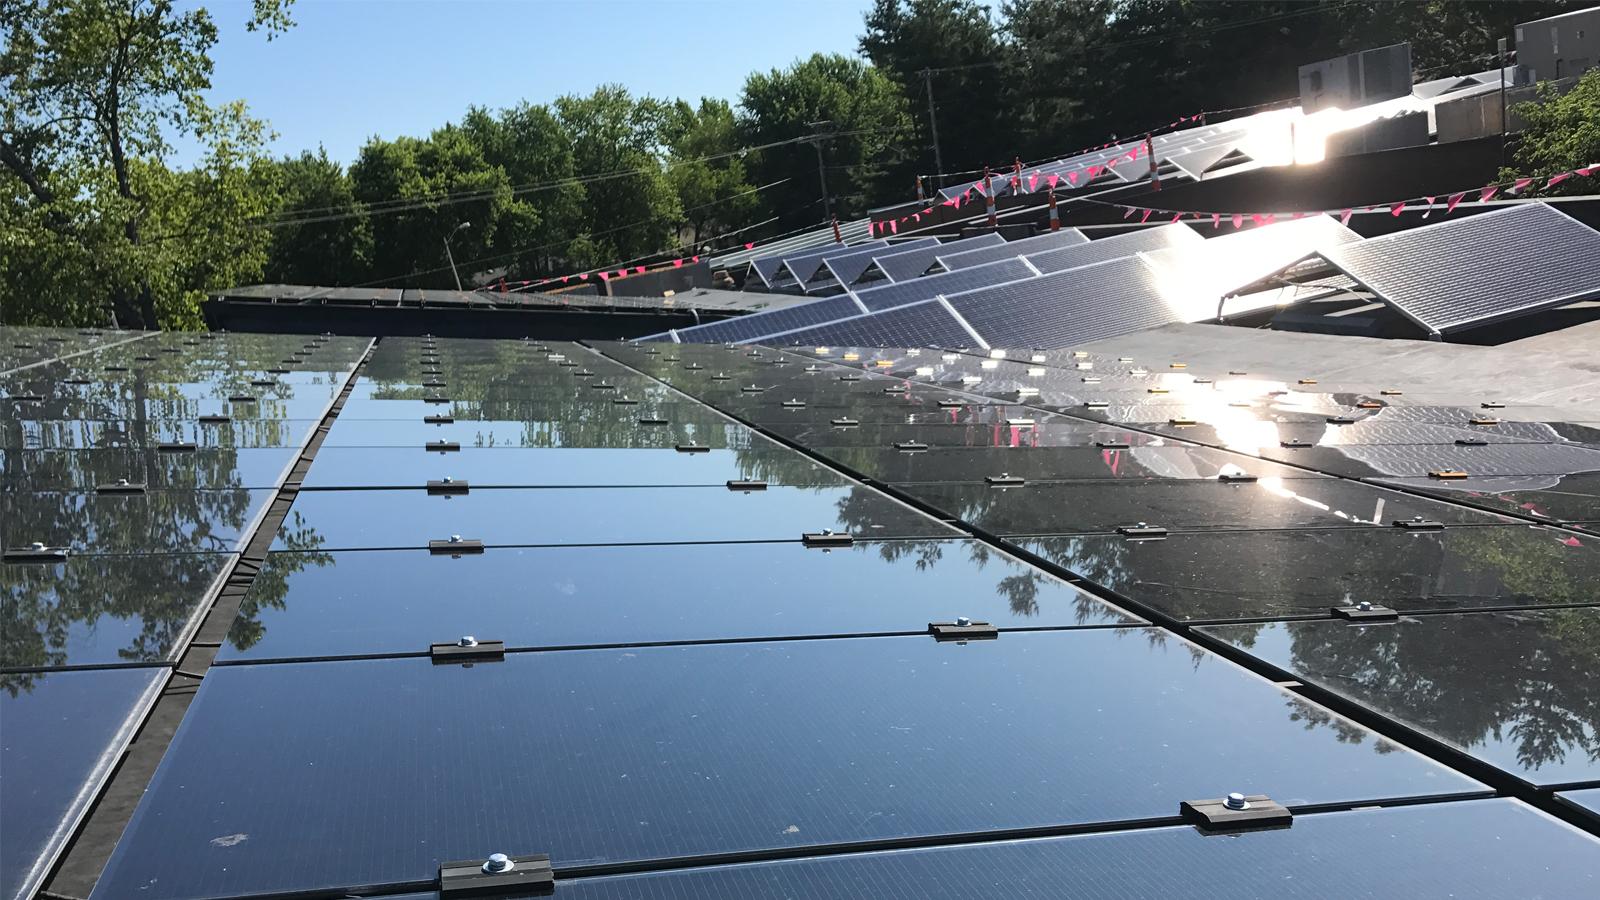 CMT's Solar Roof